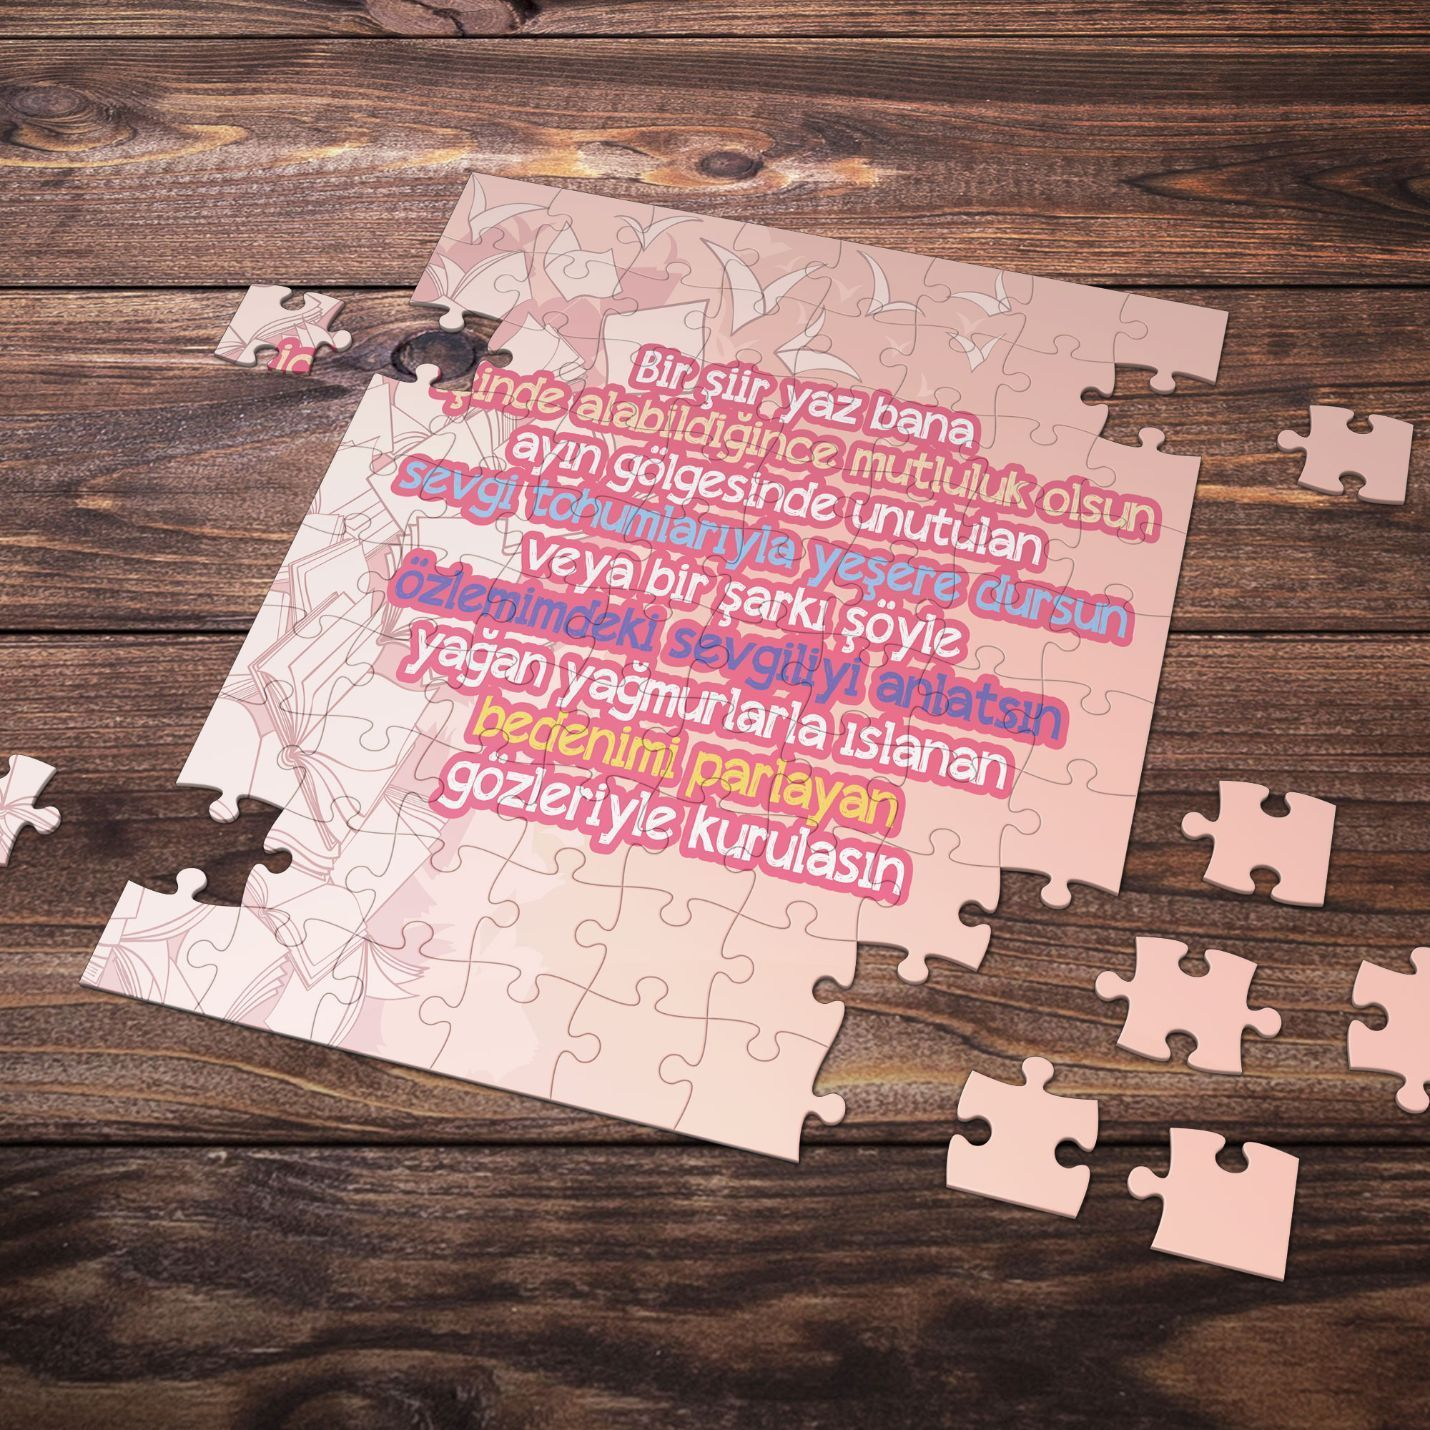 99 Parça Romantik Tasarımlı Puzzle Yapboz No6